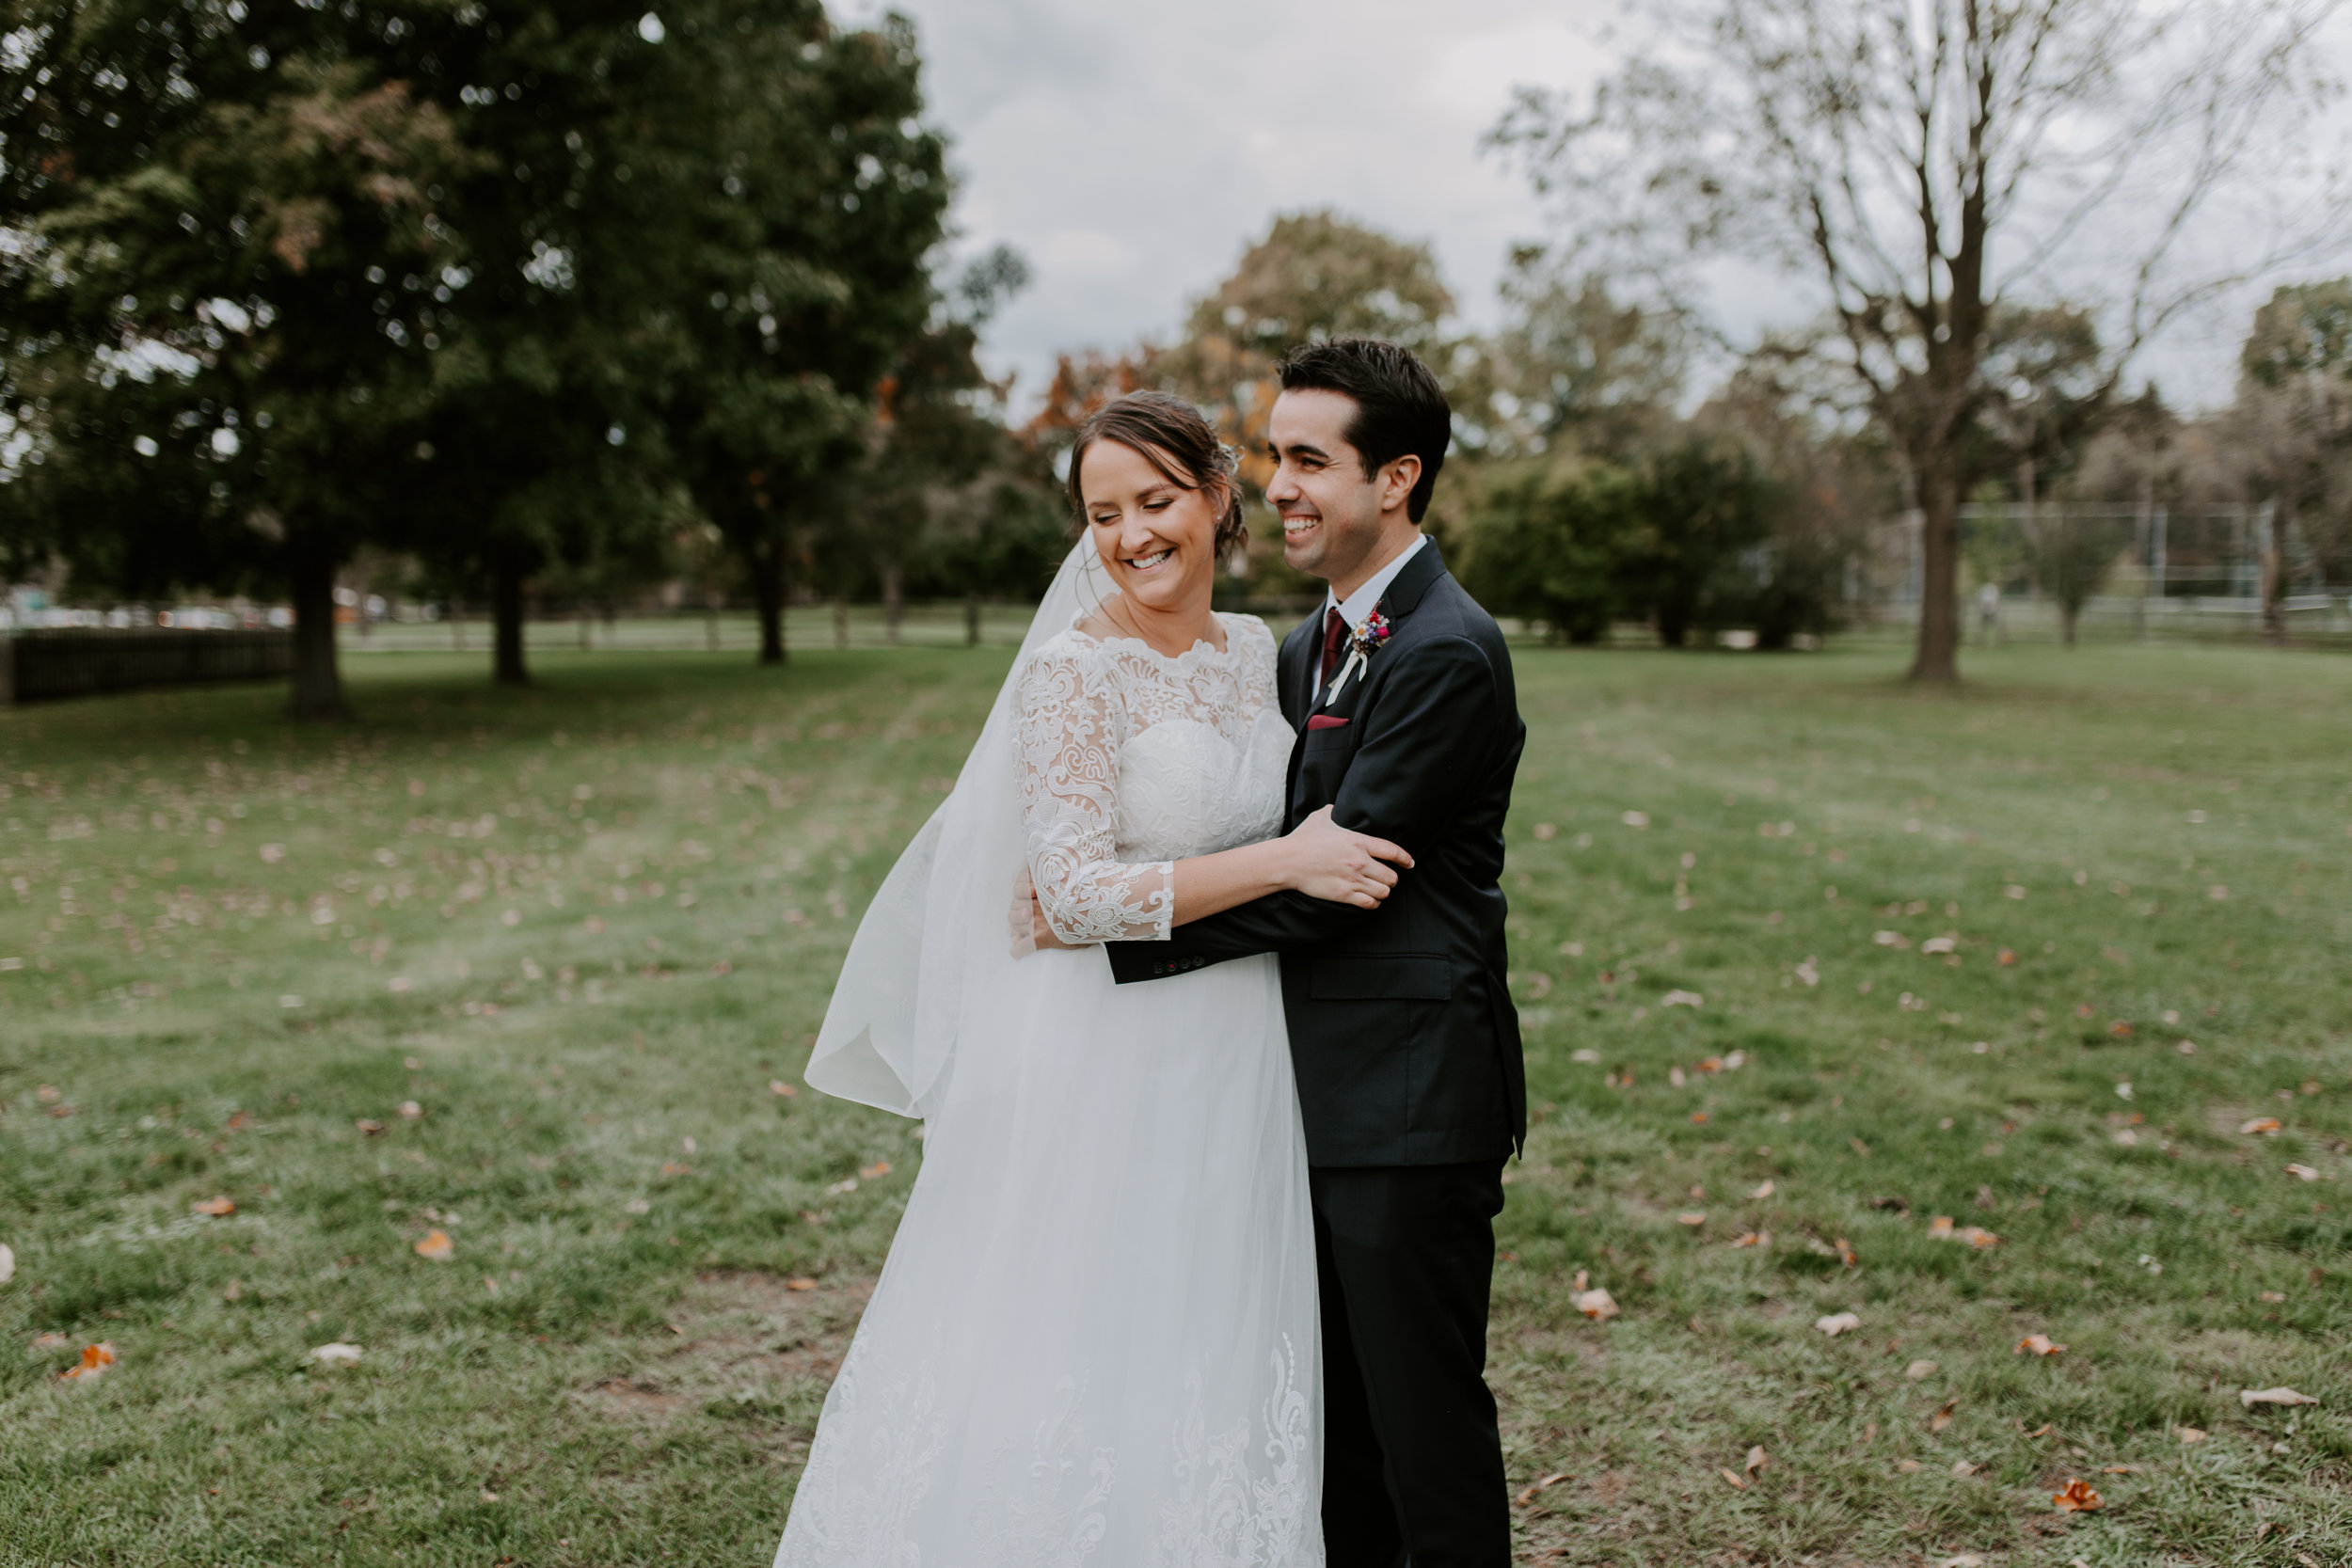 Rodrigo + Trisha - Ann Arbor, MI